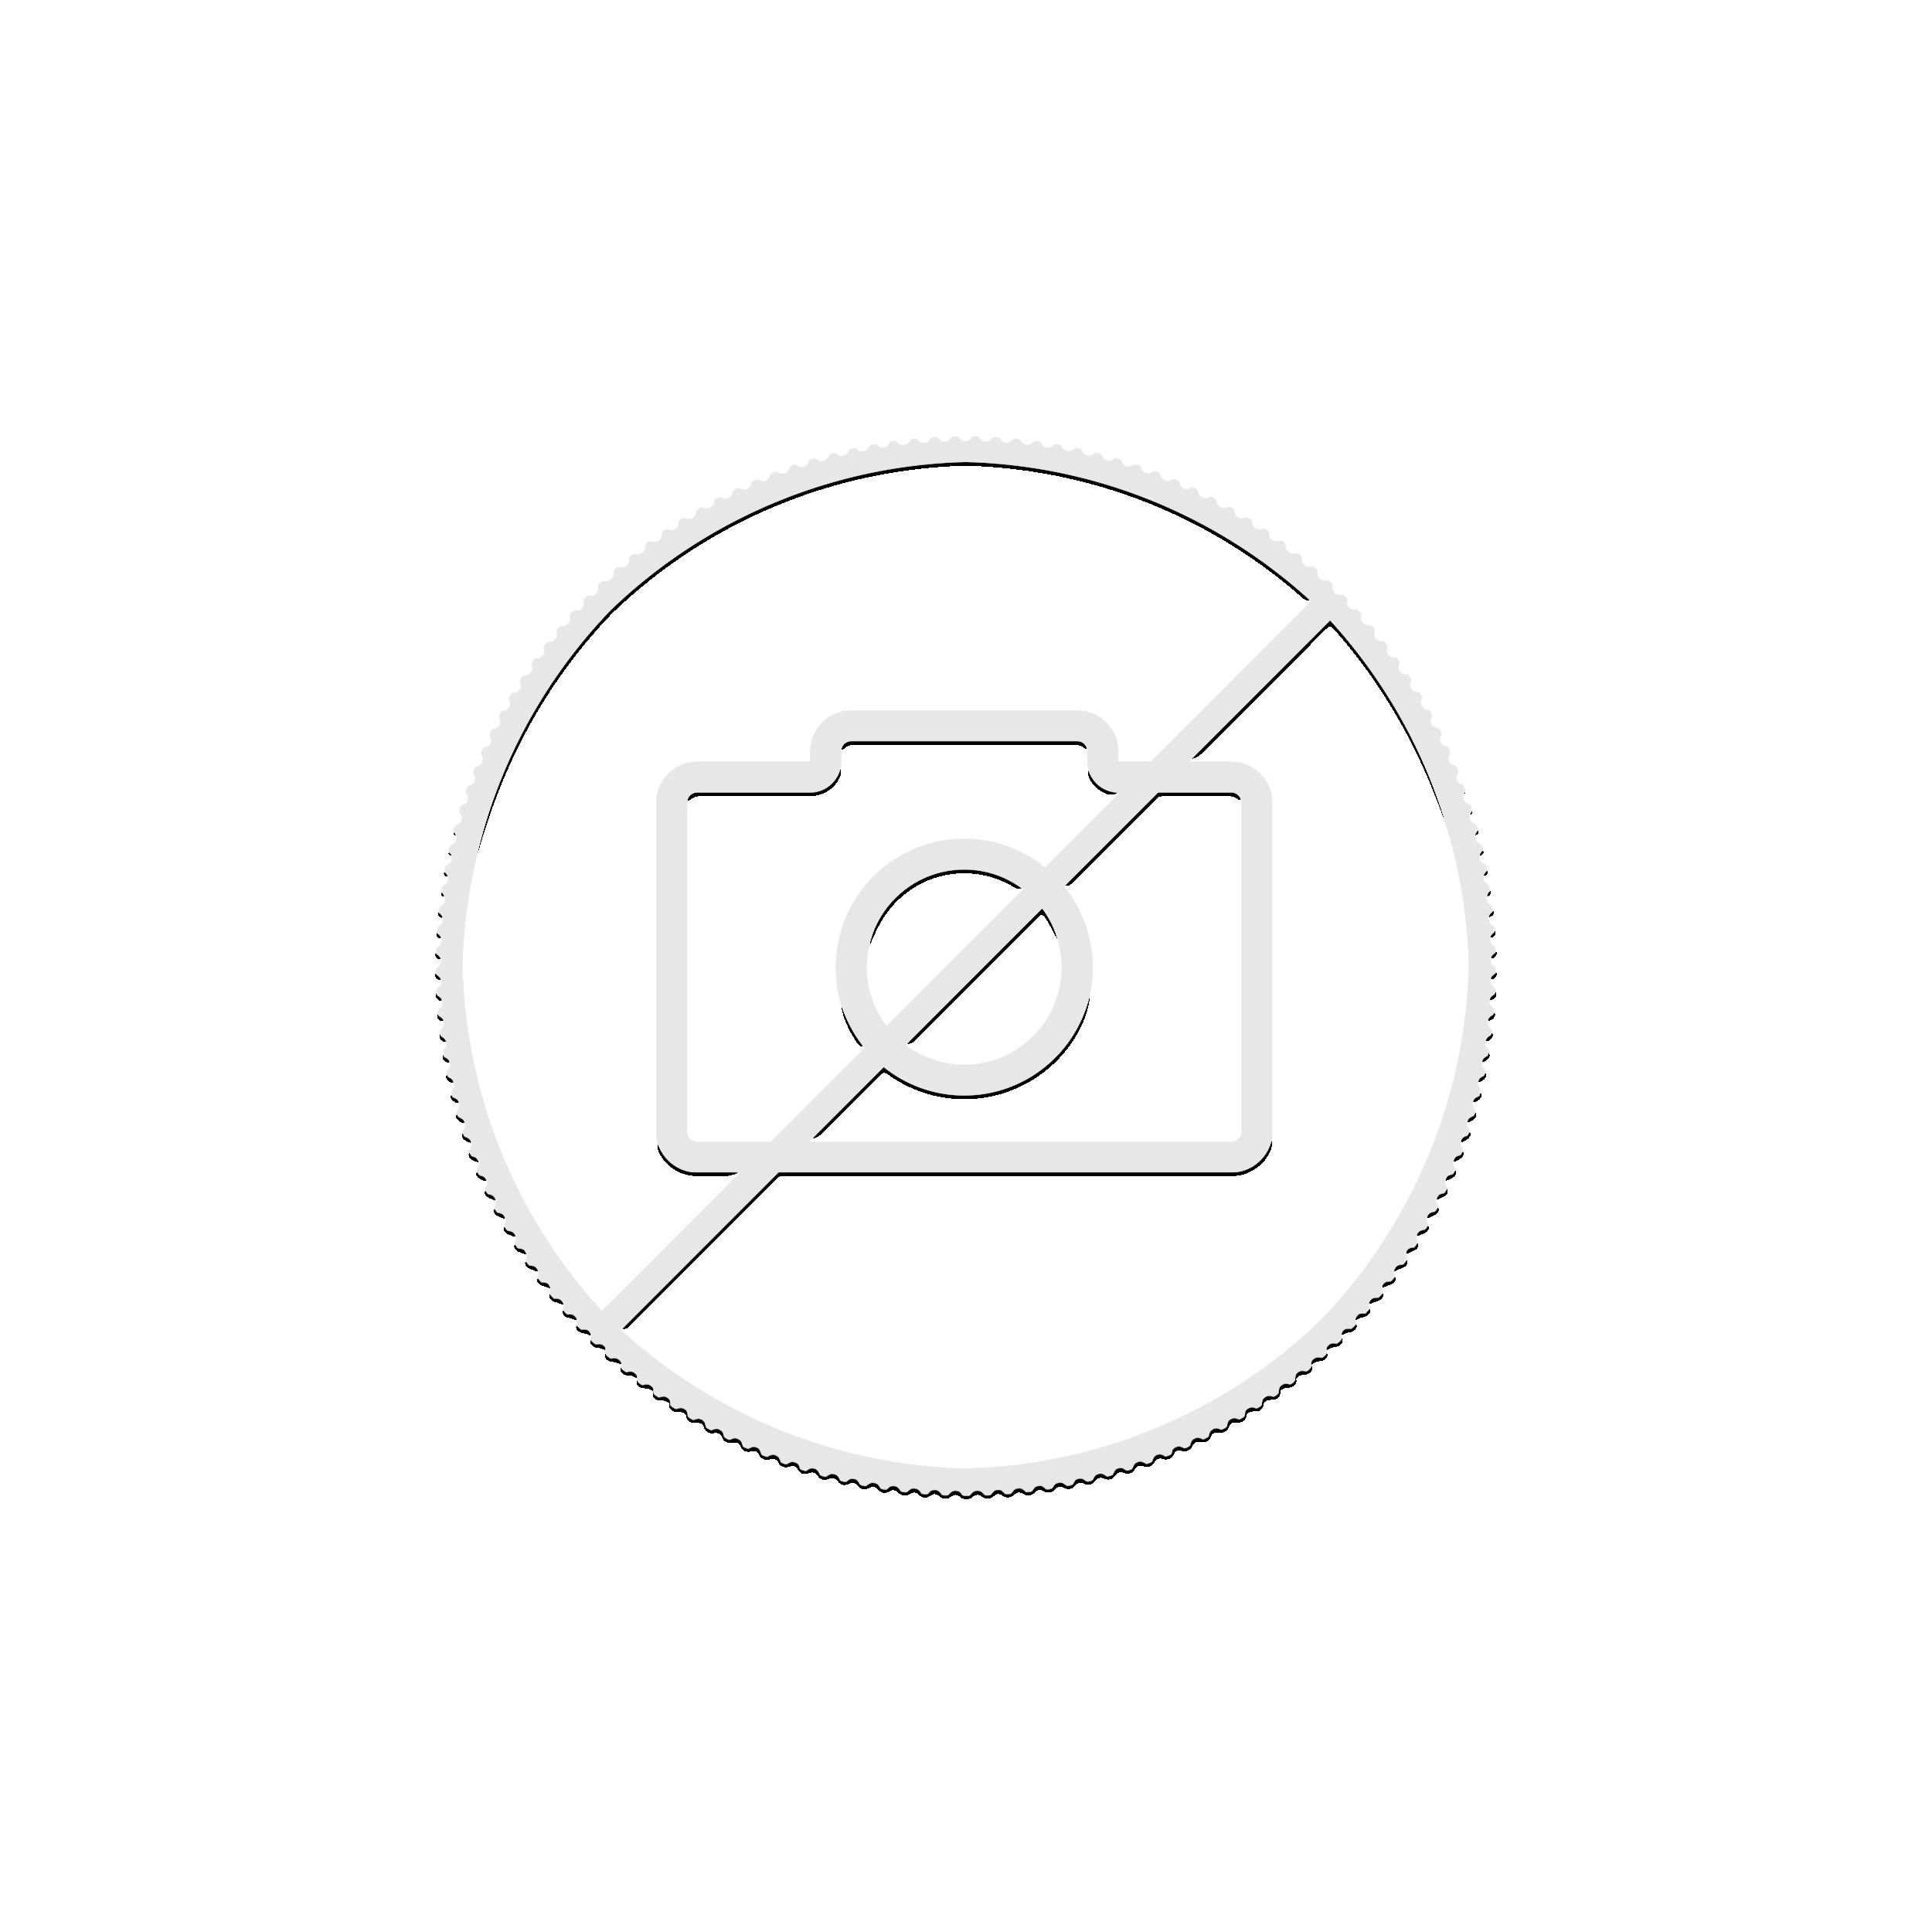 1 Troy ounce platina Wiener Philharmoniker munt 2021